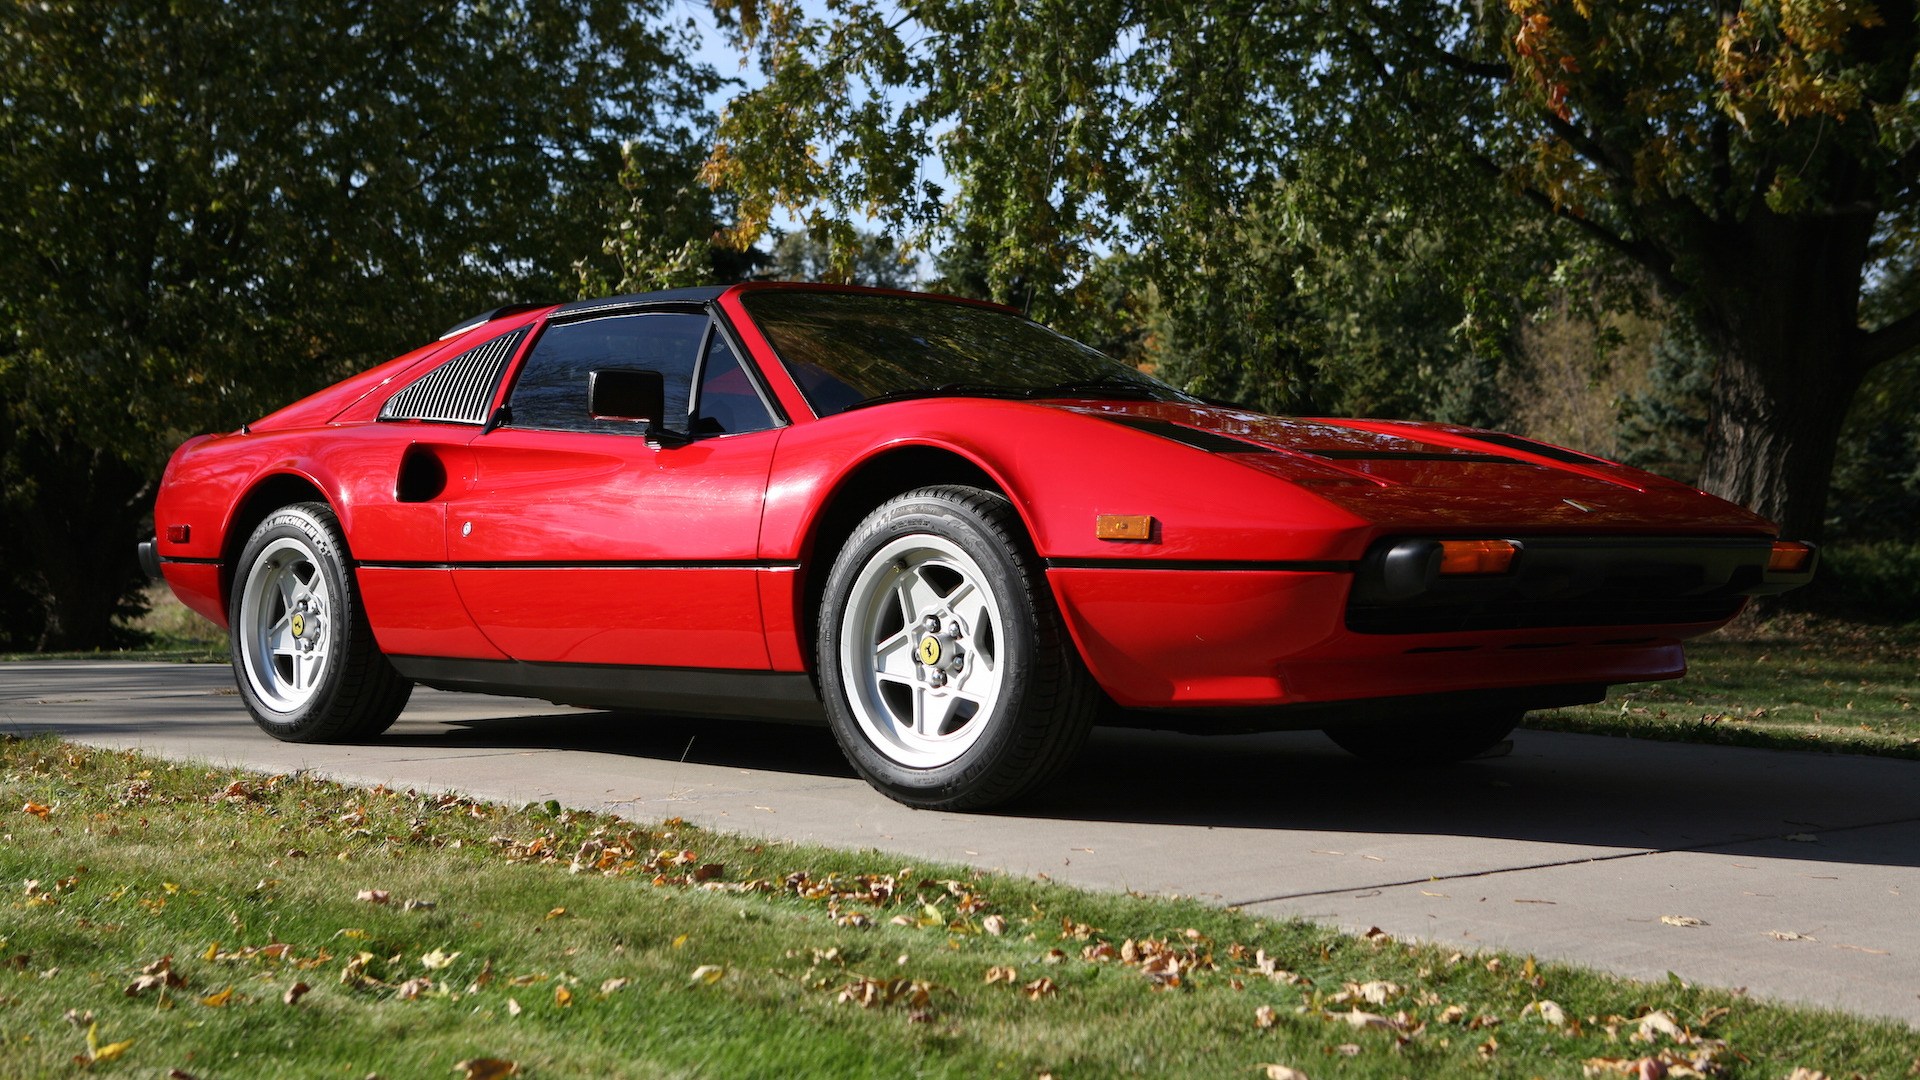 This Official Magnum P.I. Ferrari 308 Stunt Car Deserves Better